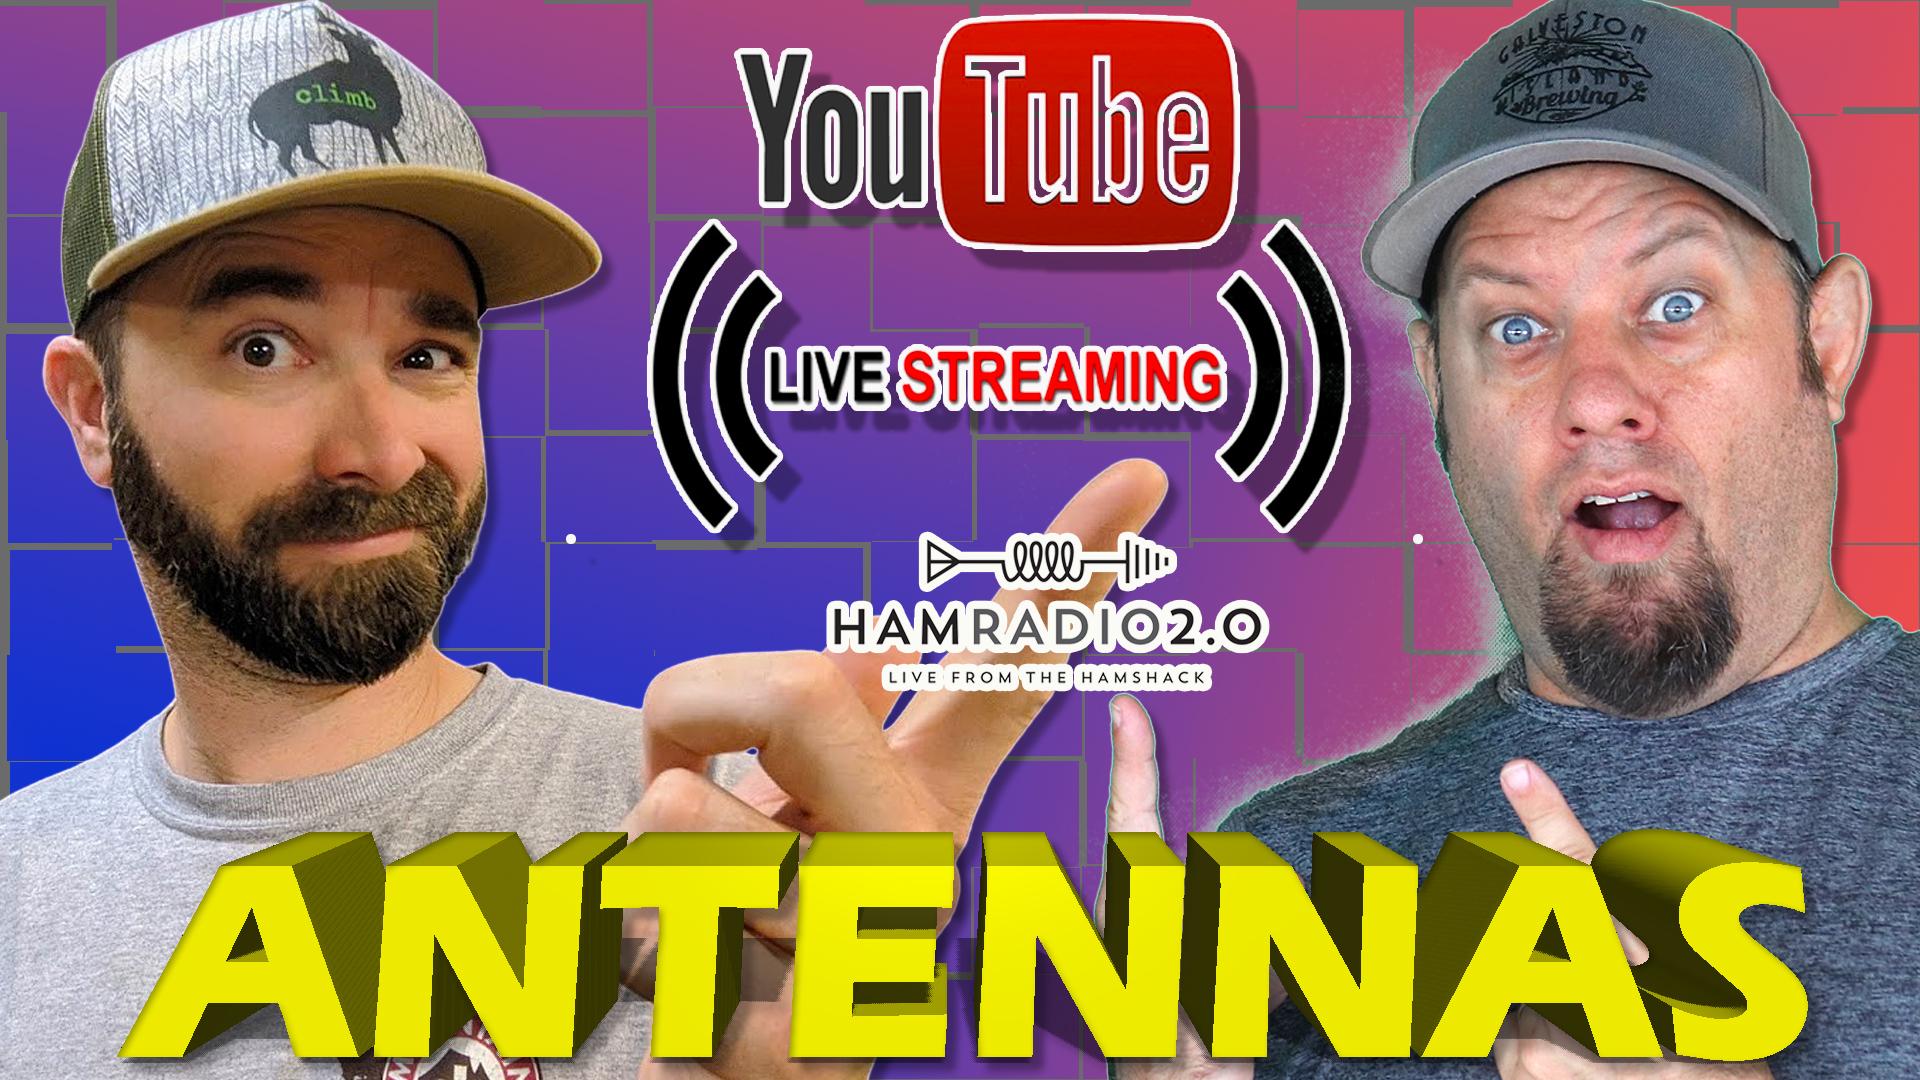 Episode 457: ANTENNAS with K6ARK – Ham Radio Antenna Livestream